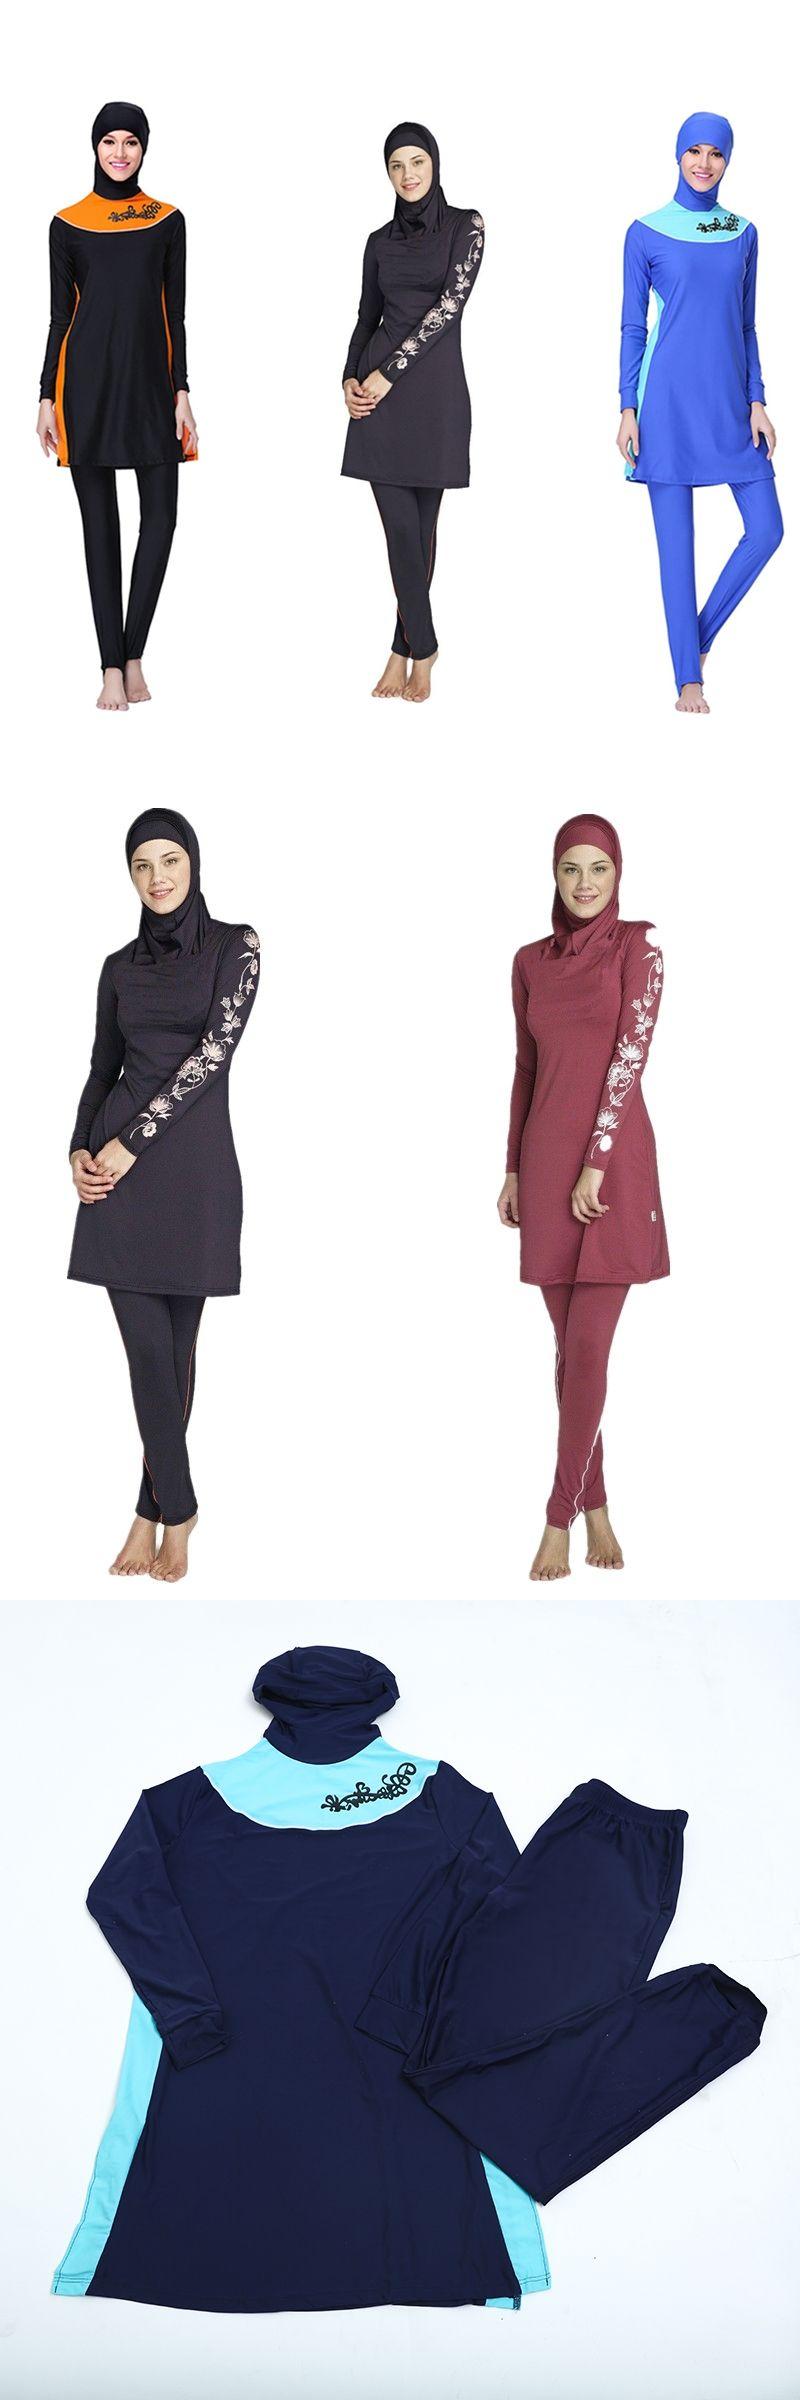 a5a7a8ef0ec1a Full Coverage Muslim Swimwear Islamic Swimsuit For Women Black Arab  Beachwear Hijab Plus Size Two Piece